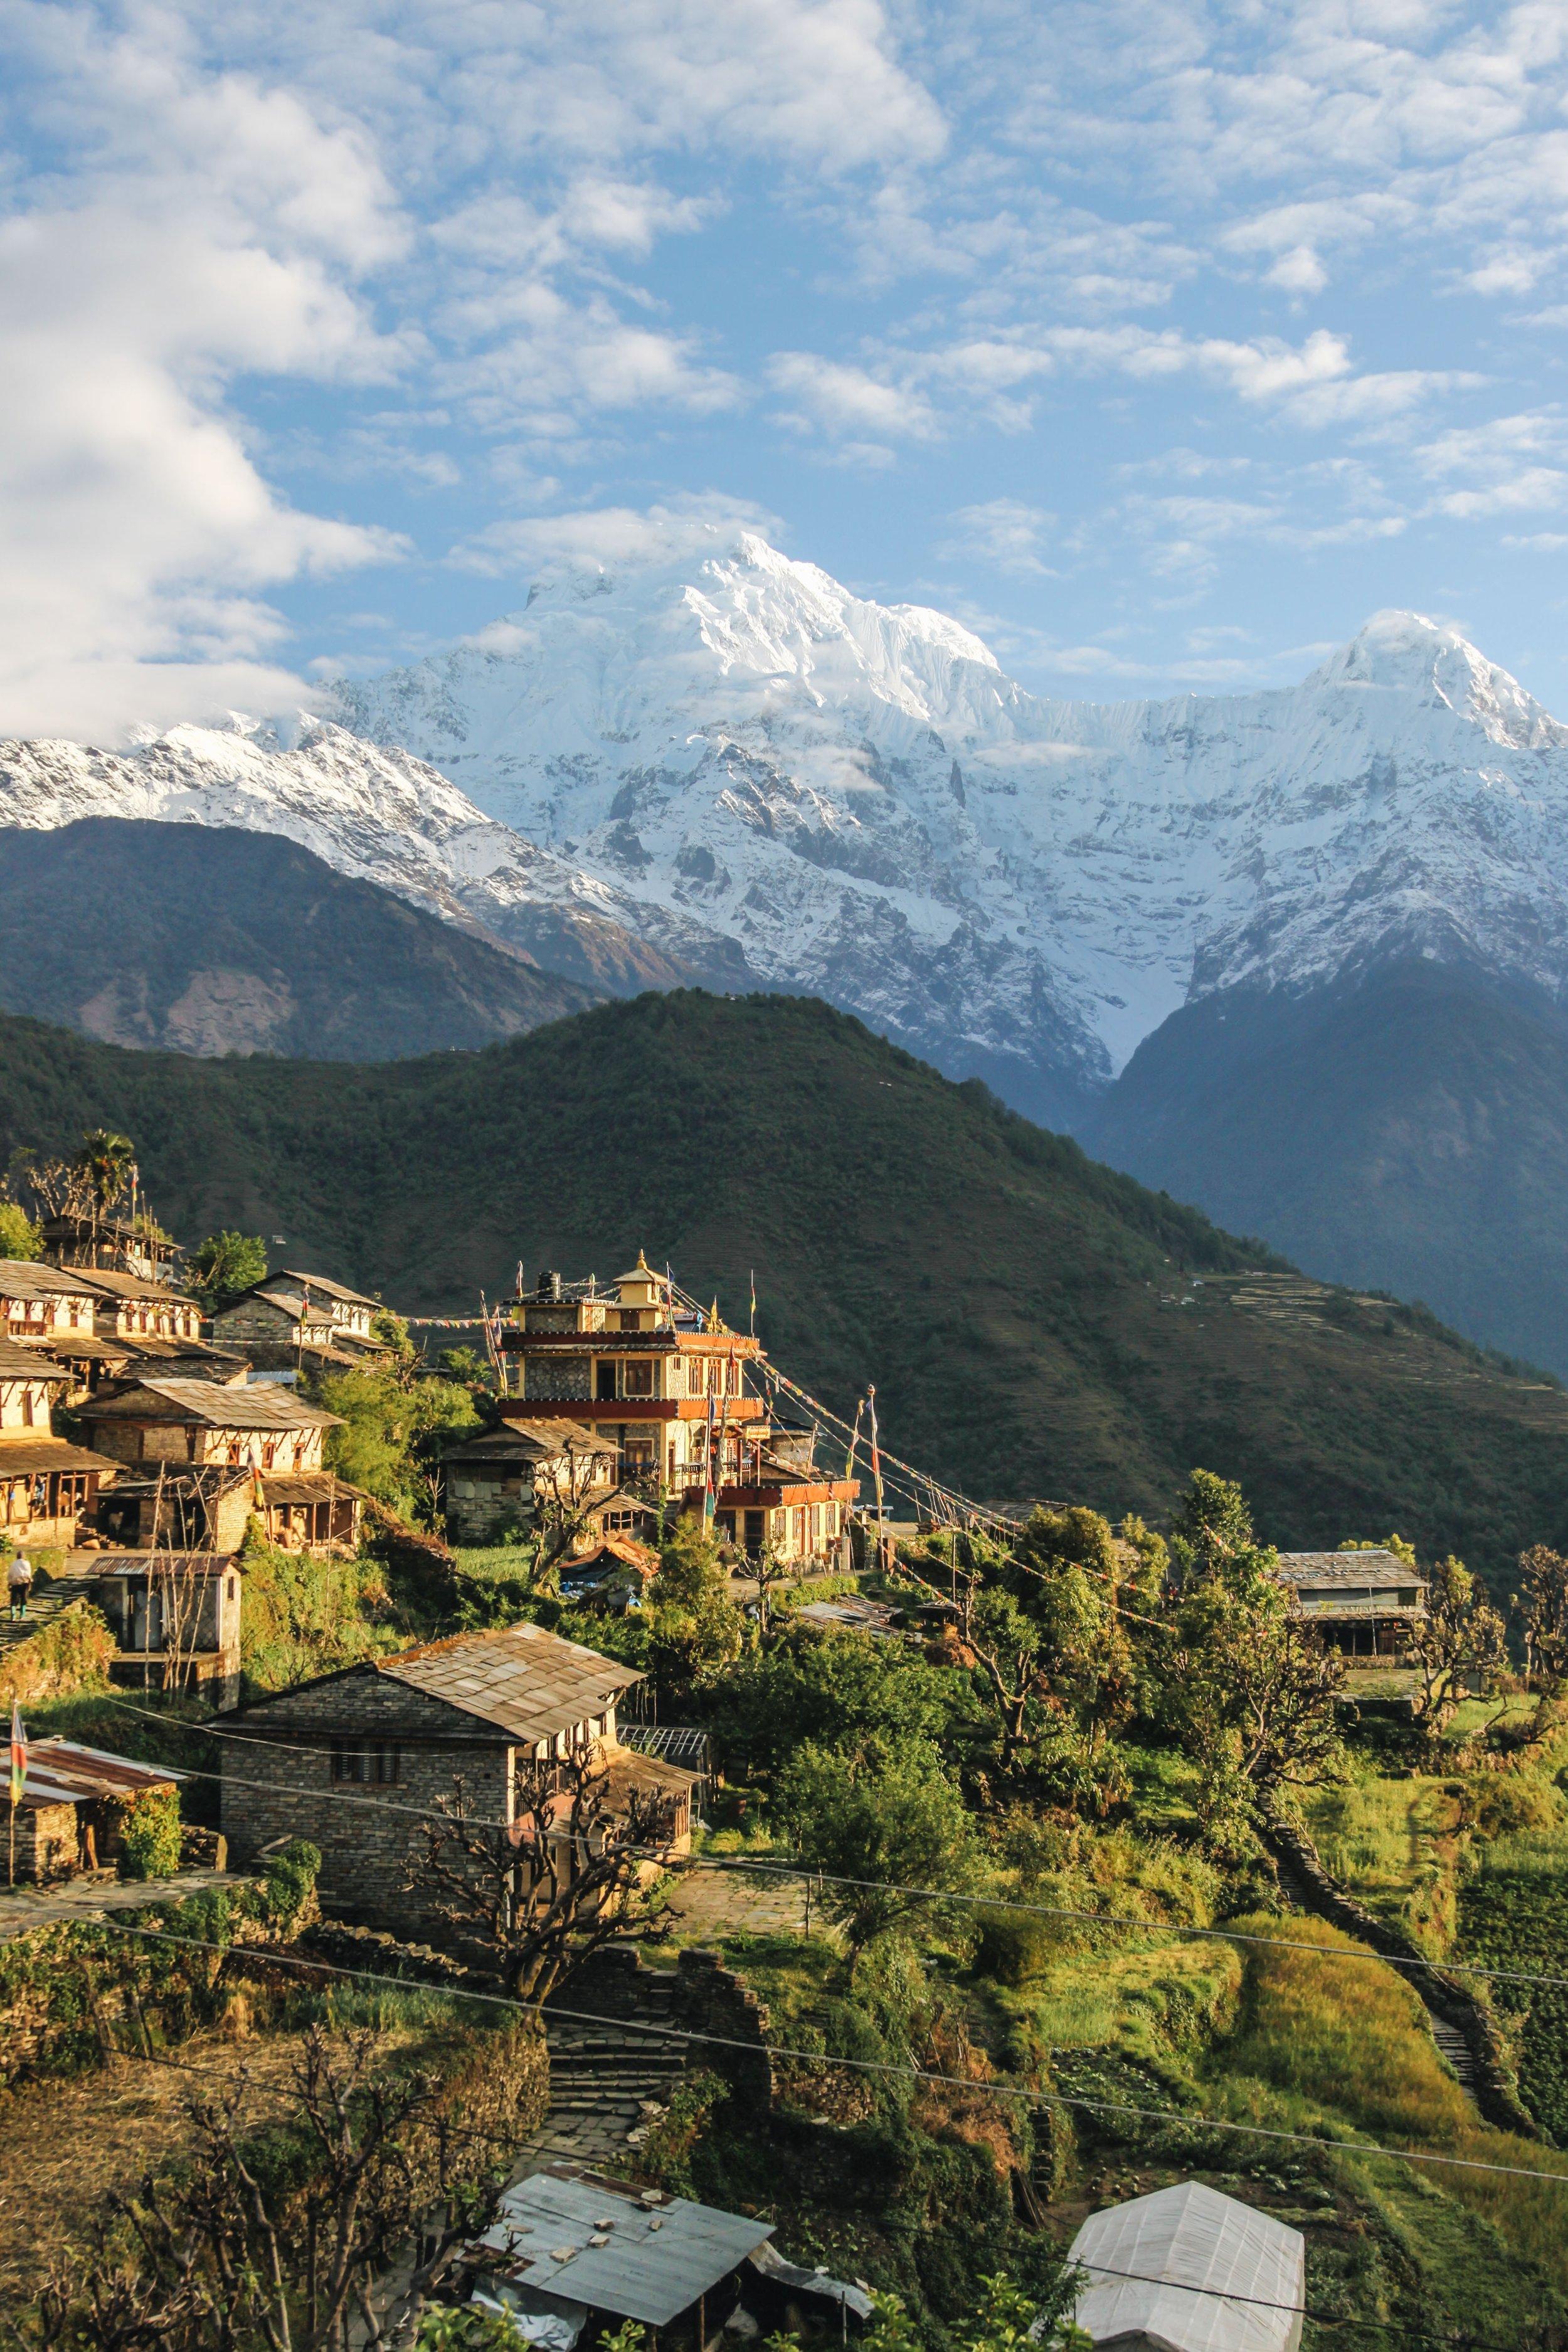 Photo of Nepalese mountain village by Giuseppe Mondì on Unsplash